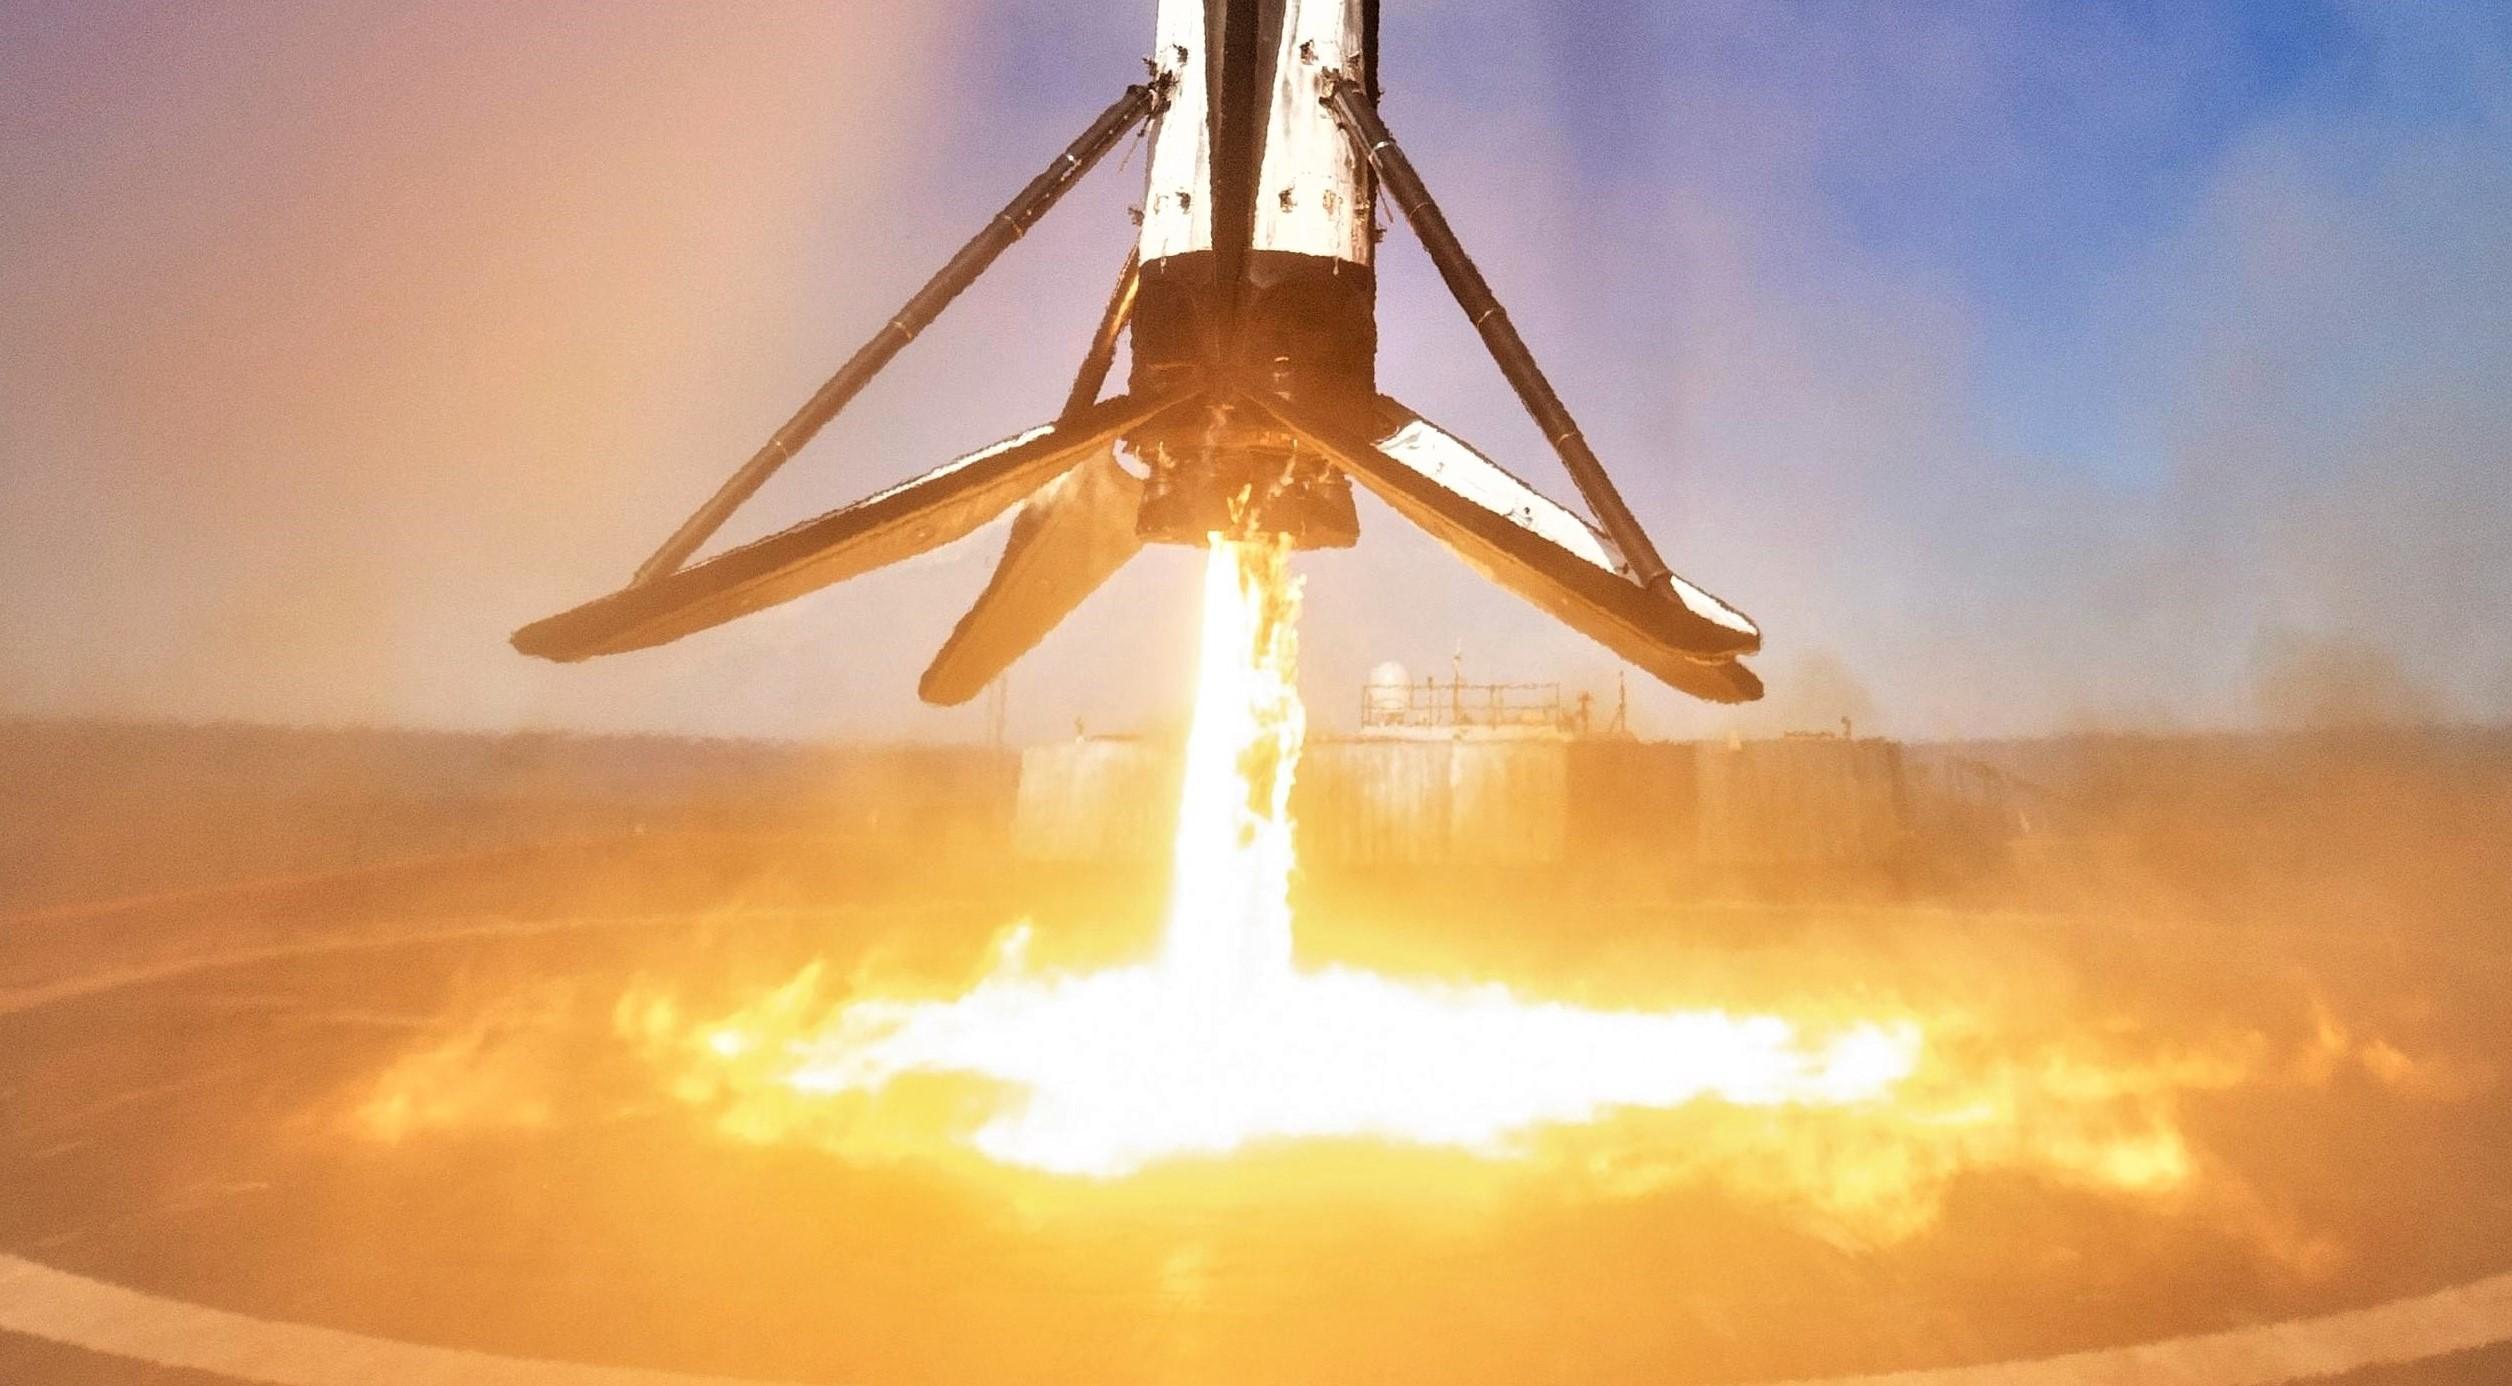 Falcon 9 B1046 SSO-A third landing (SpaceX) 2 edit 2(c) 1